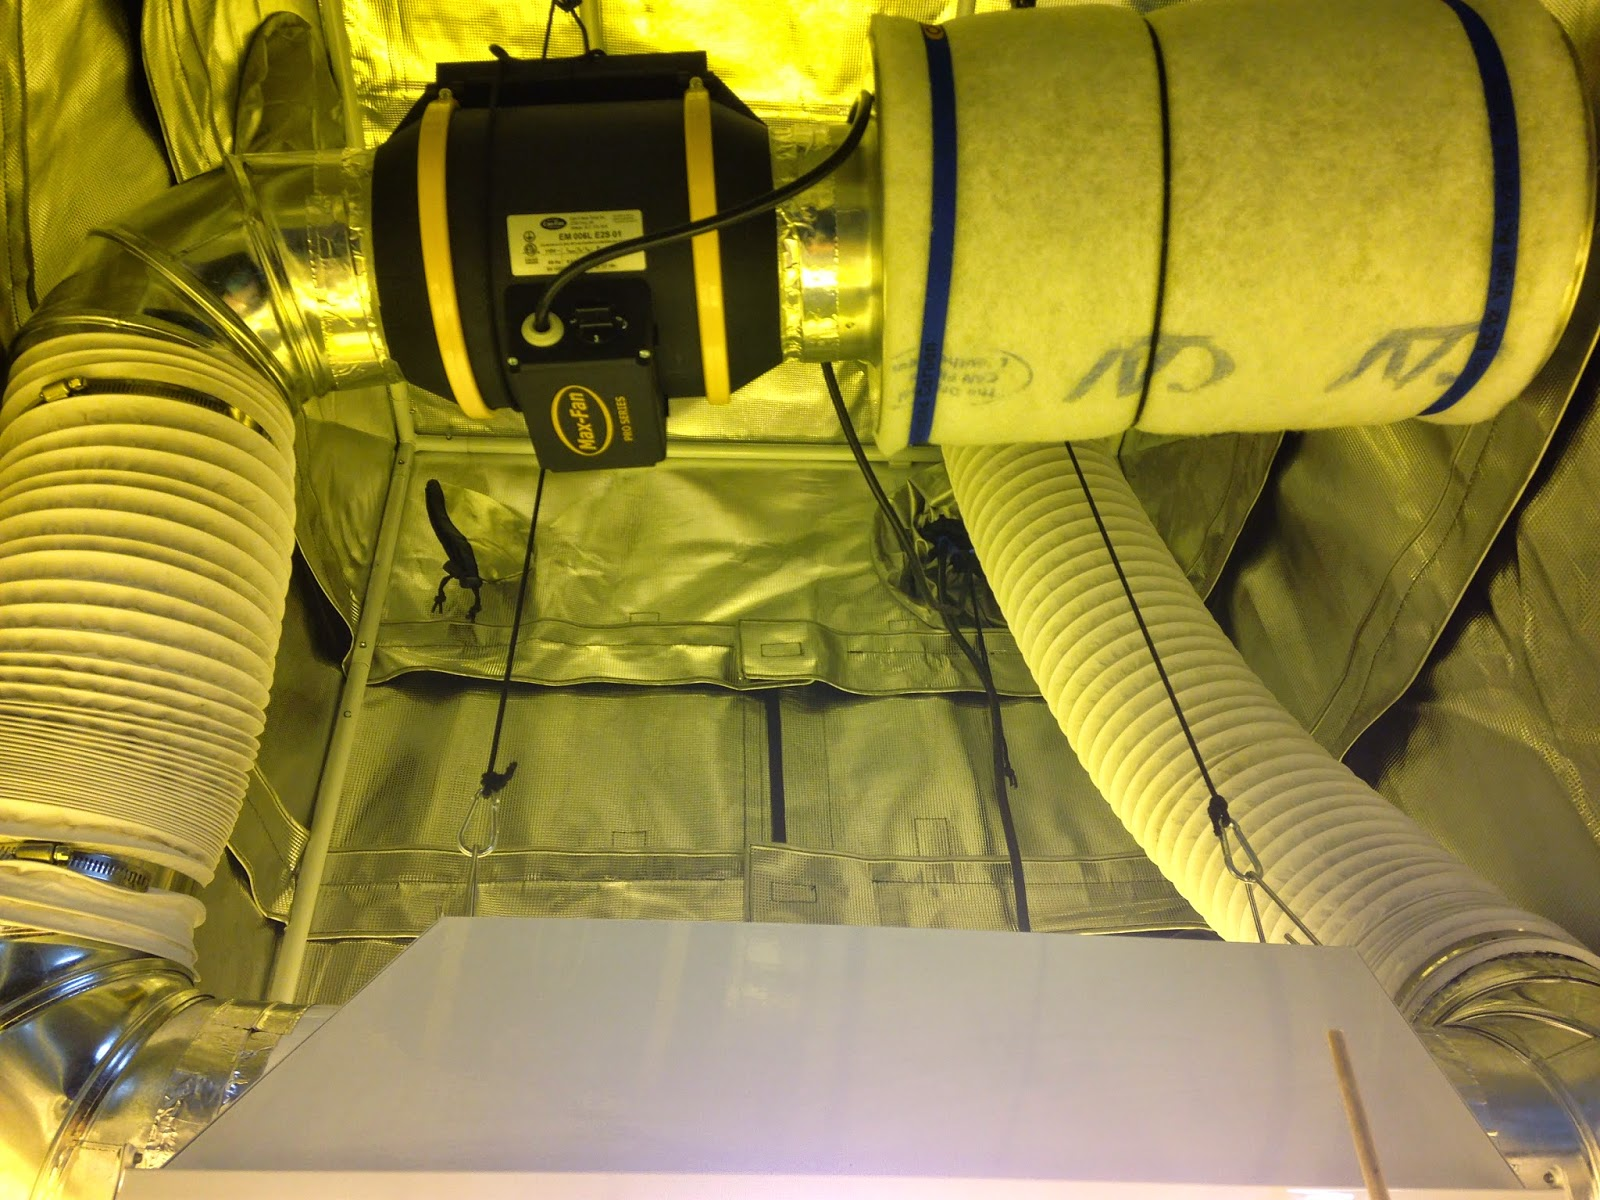 ... 6  Pro Series Max Fan w/ 3 speed settings (420 378 u0026 291 CFM)  6 x16  Mini Can-Lite carbon filter premium 6  PVC-coated Max Duct). & The Grow Room: Special: Premium 3u0027x3u0027 Grow Tent Set-Up